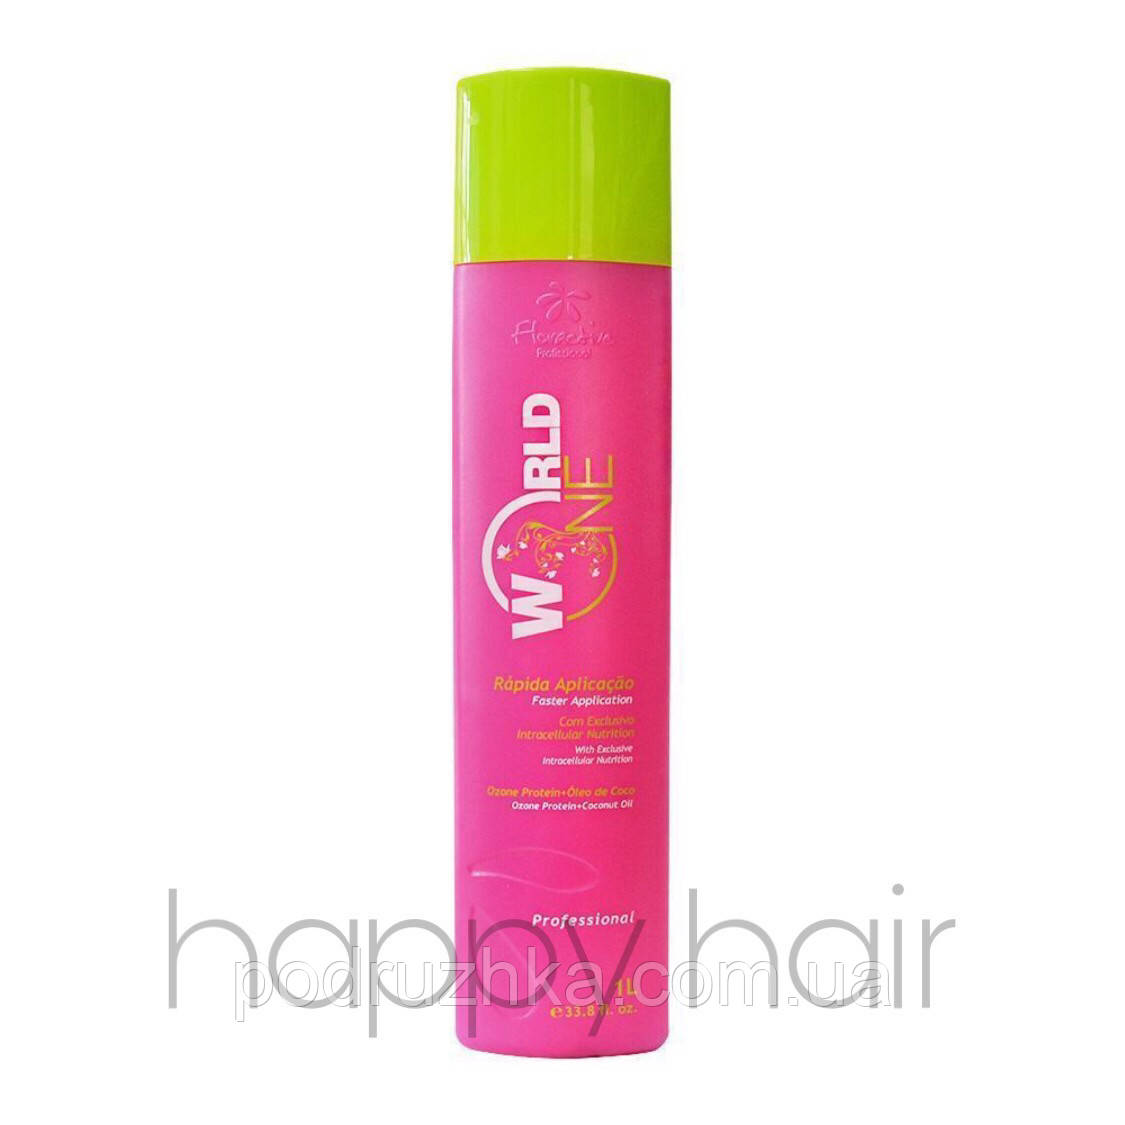 Нанопластика для волос Floractive W.One 500 г